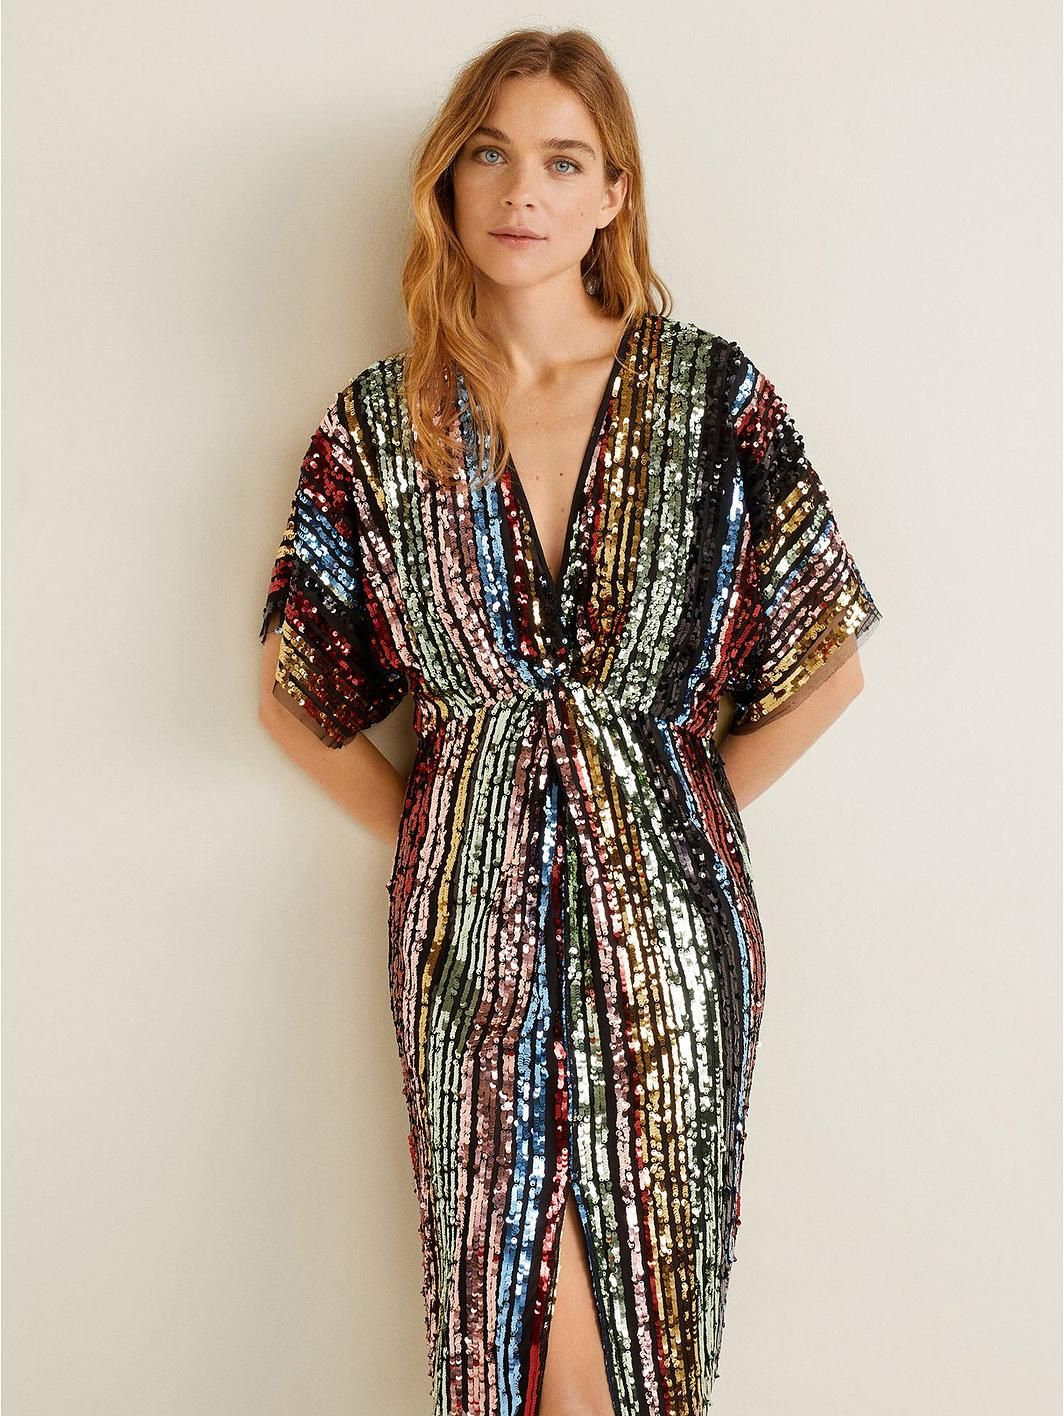 35f54230953d0 Mango Rainbow Sequin Dress - Multi in 2019 | clothes | Sequin Dress ...